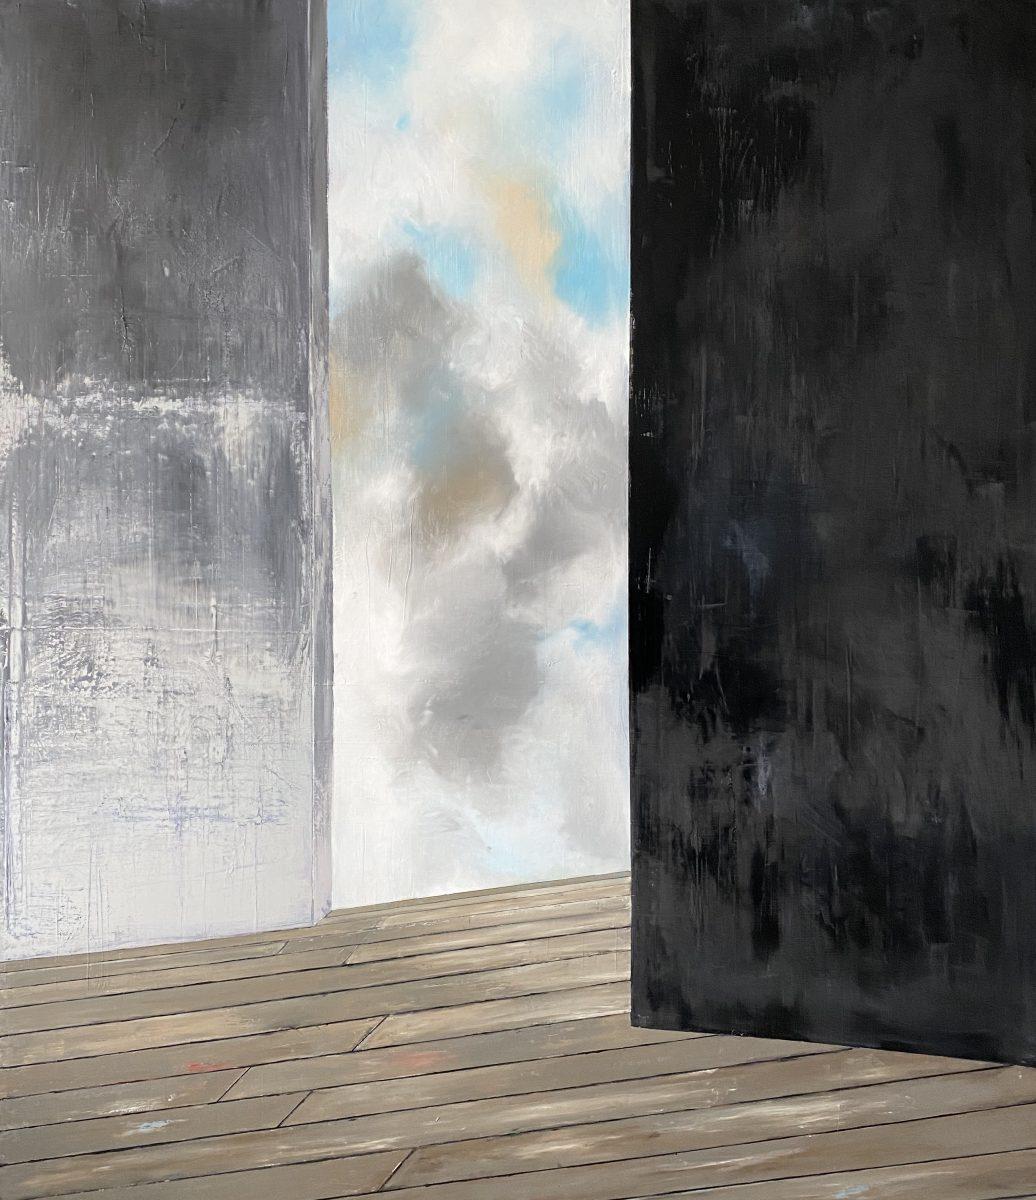 Manifesto del tempo-Manifesto del Tempo Nr. 7-Öl auf Leinwand - 230 x 200 cm - 2020